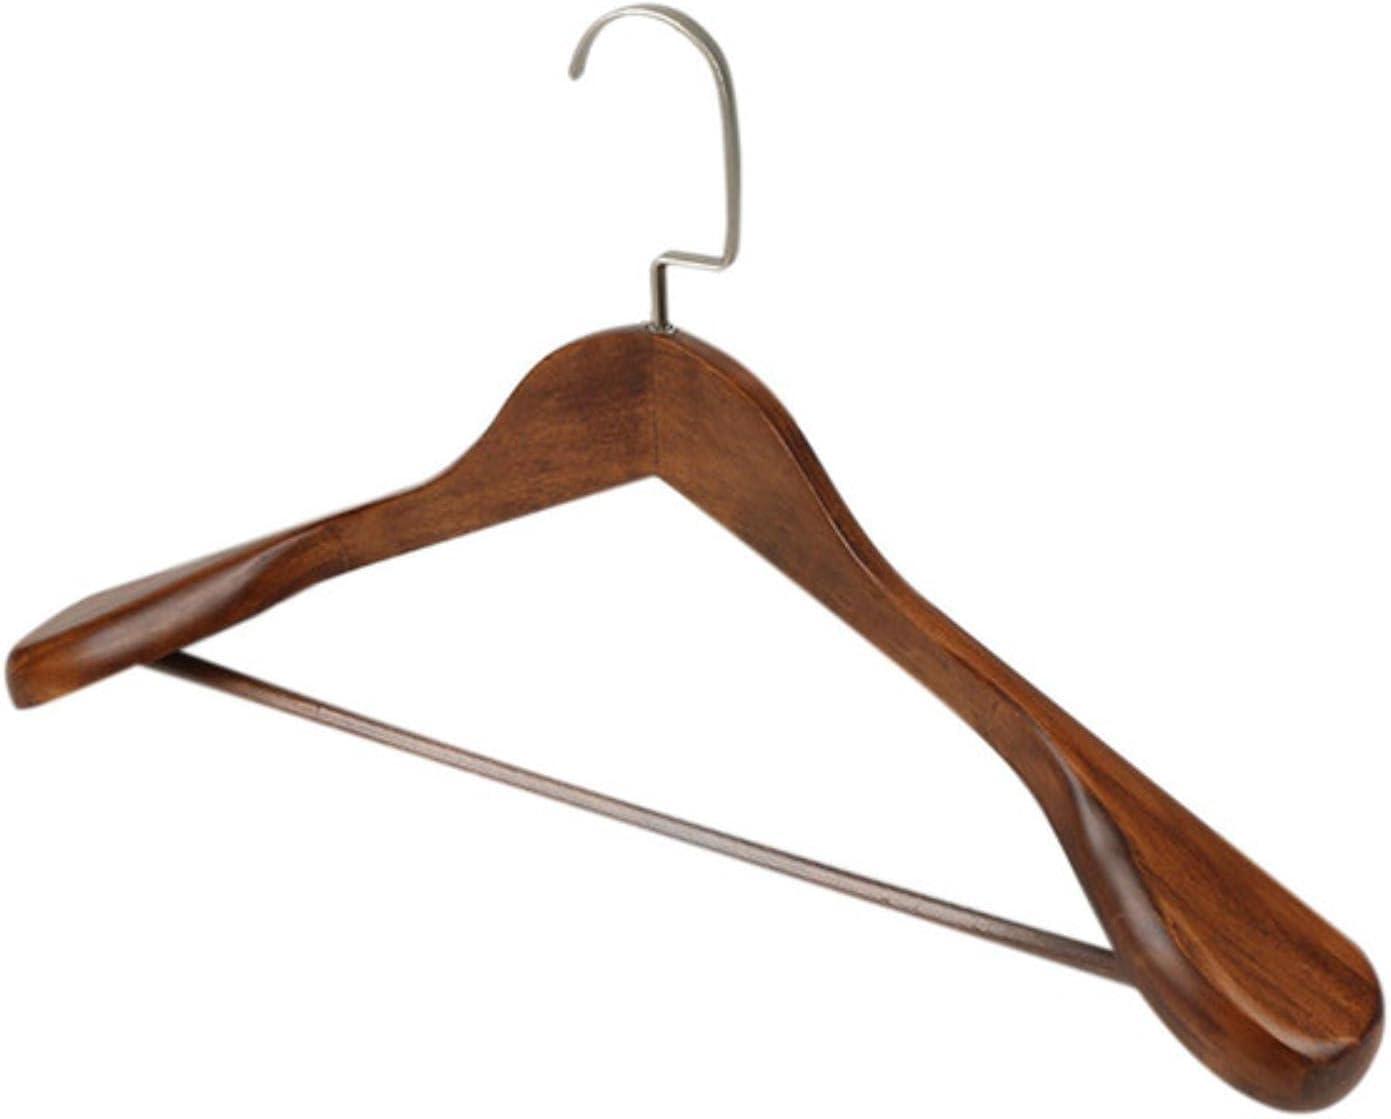 Max 60% OFFicial site OFF Lzjbs 1Pc Clothes Hanger High-Grade Wide Shoulder Wooden Ha Coat